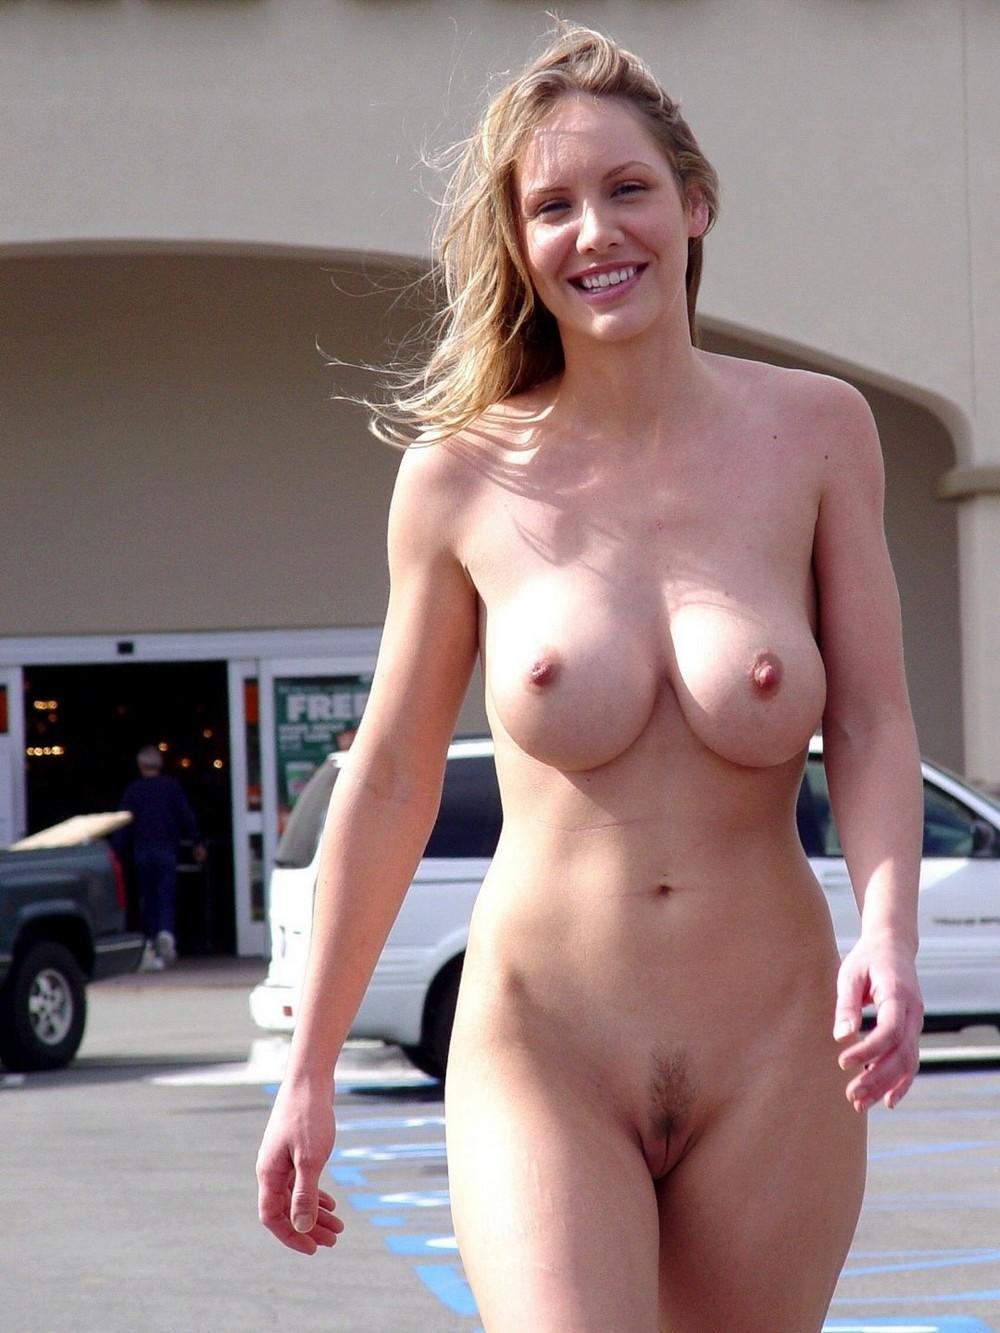 Nude dutch photo, hairy italian babes naked